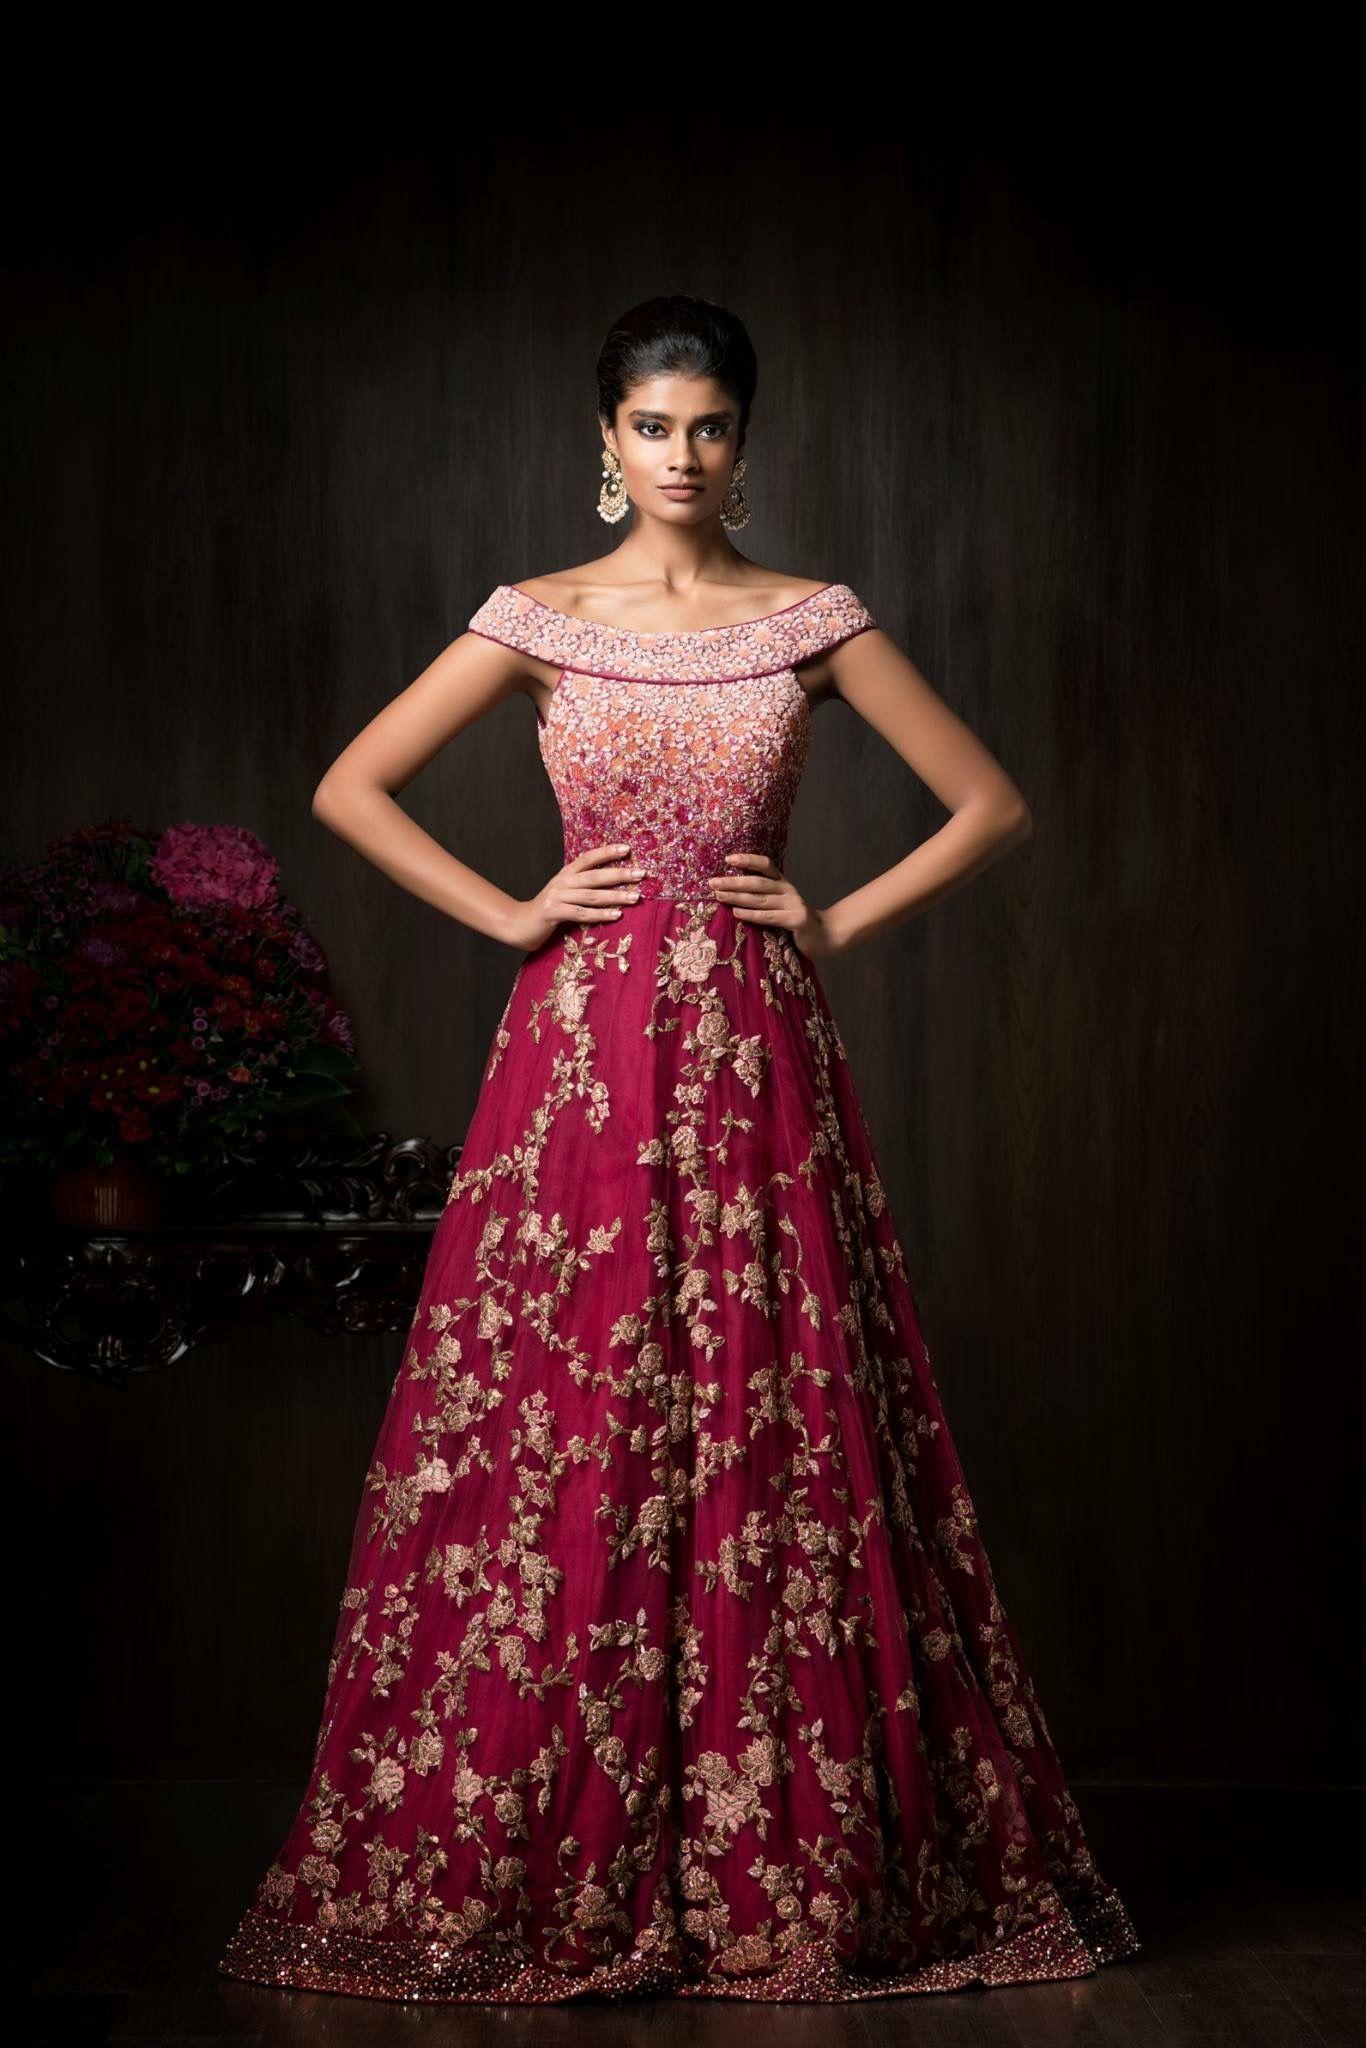 Asian Party Dresses